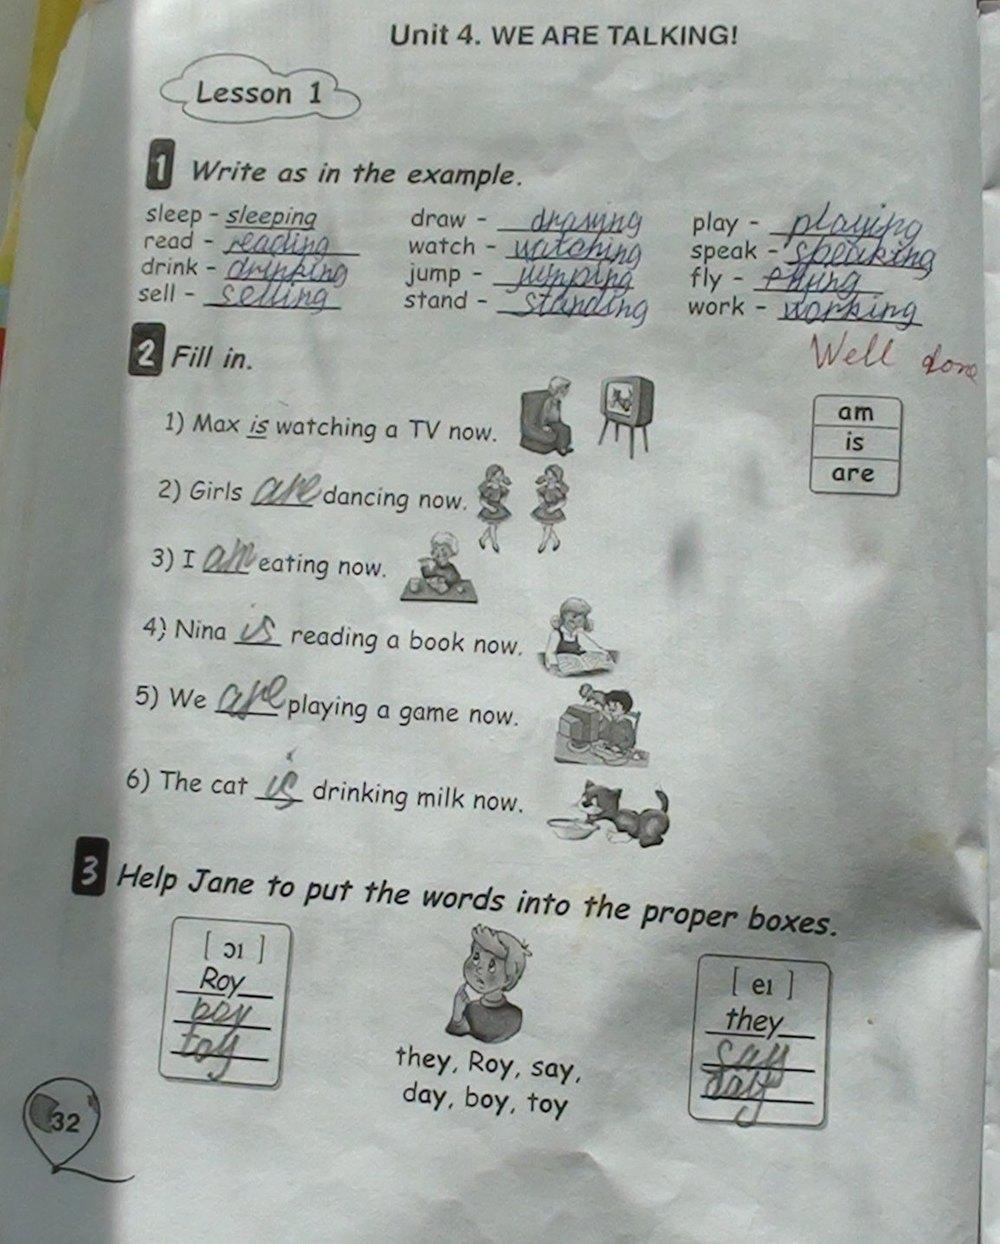 гдз 5 класс английский язык oksana karpiuk готове стара программа